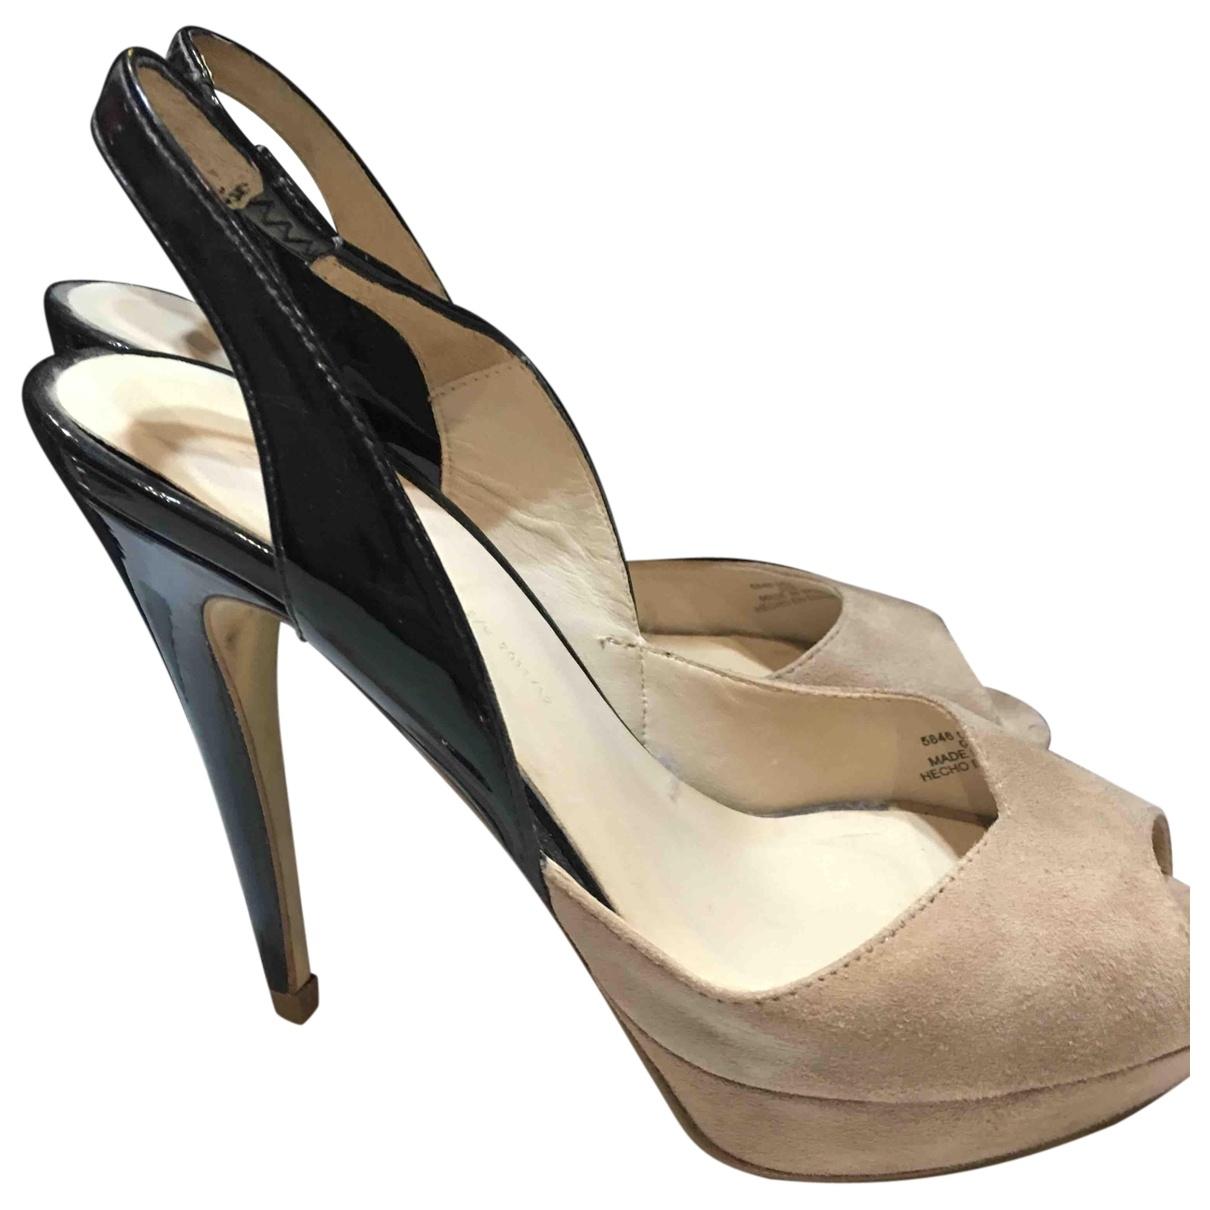 Zara \N Suede Heels for Women 37 EU